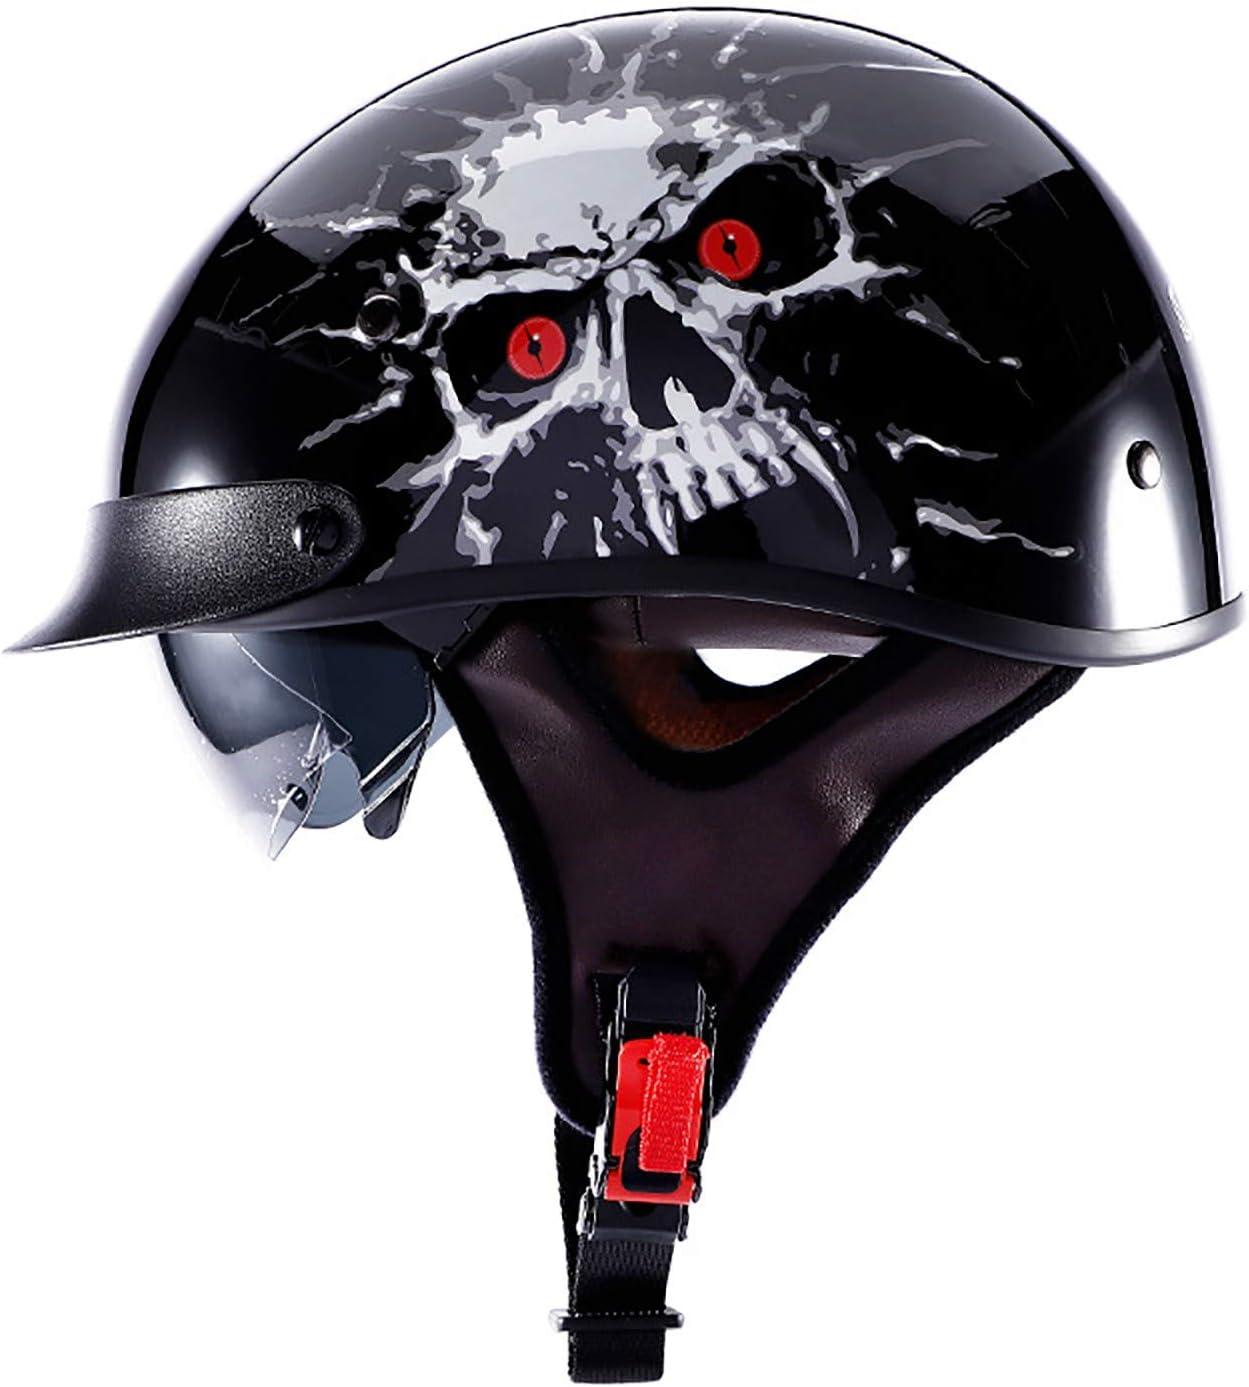 Classic Motorcycle 25% OFF Half Helmet Cruiser Bike A Black DOT Chopper Large special price !!